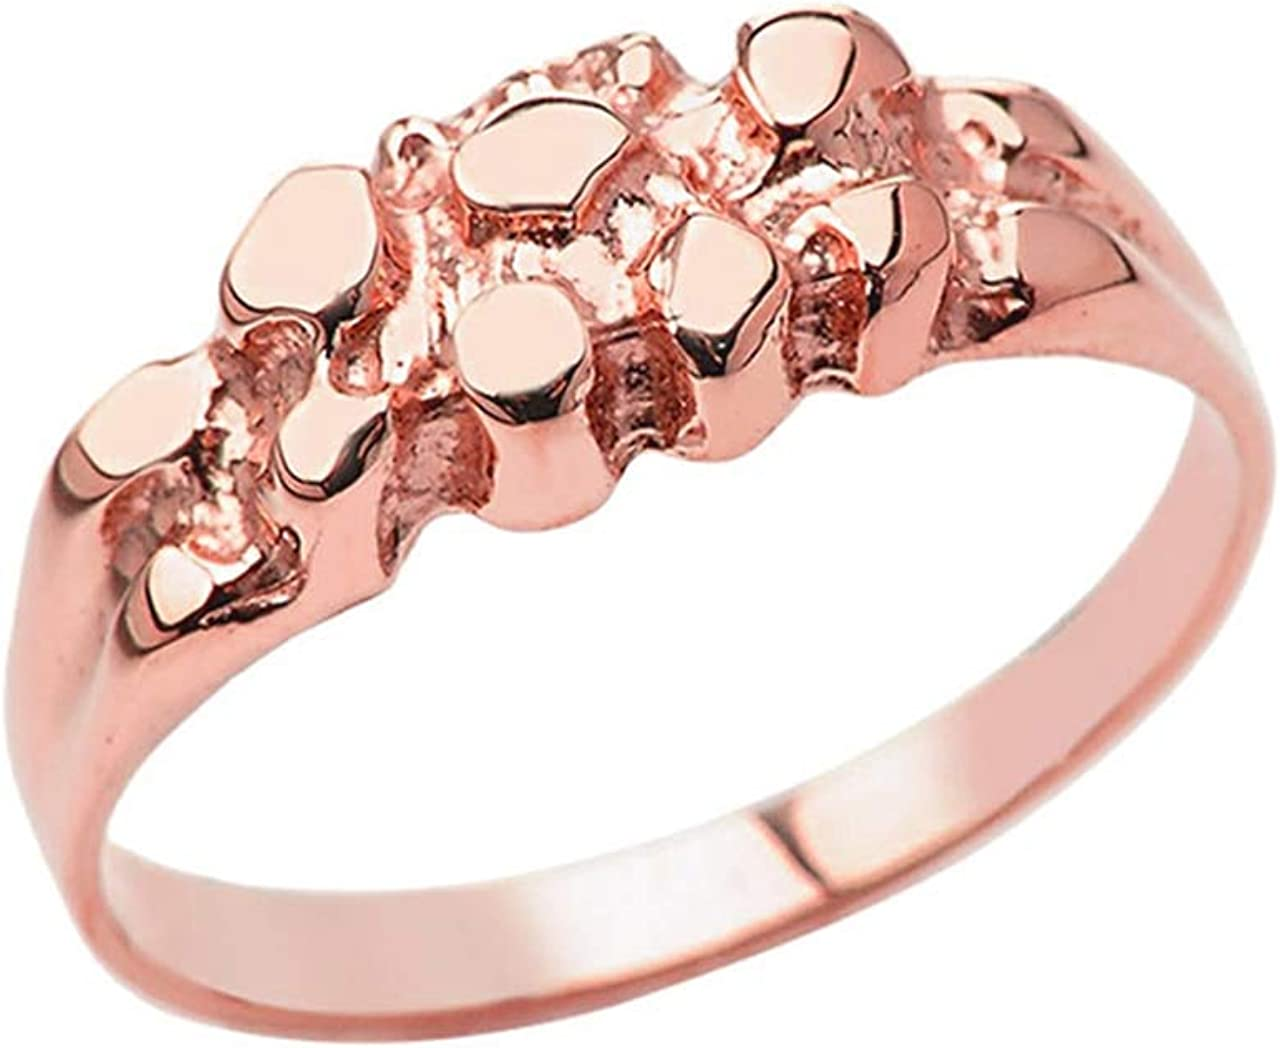 Certified Men's 10k Gold Pinky Nugget Ring